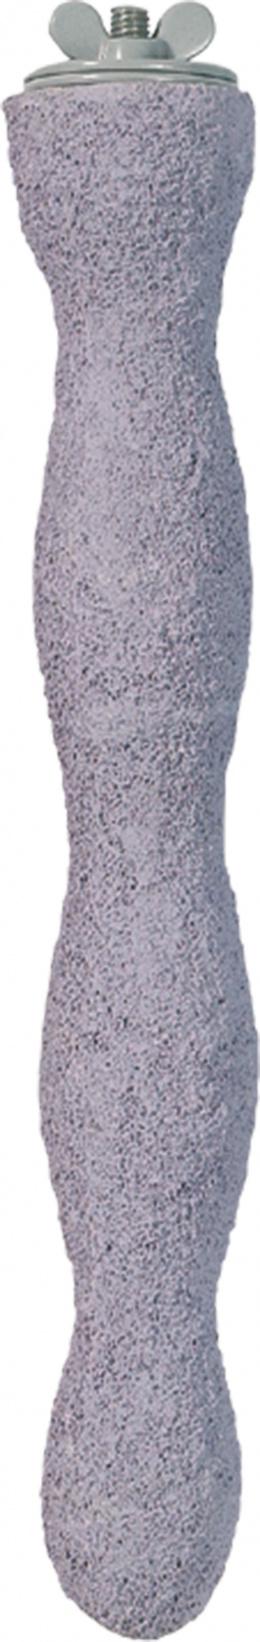 Bidielko cement 34cm pr.6cm